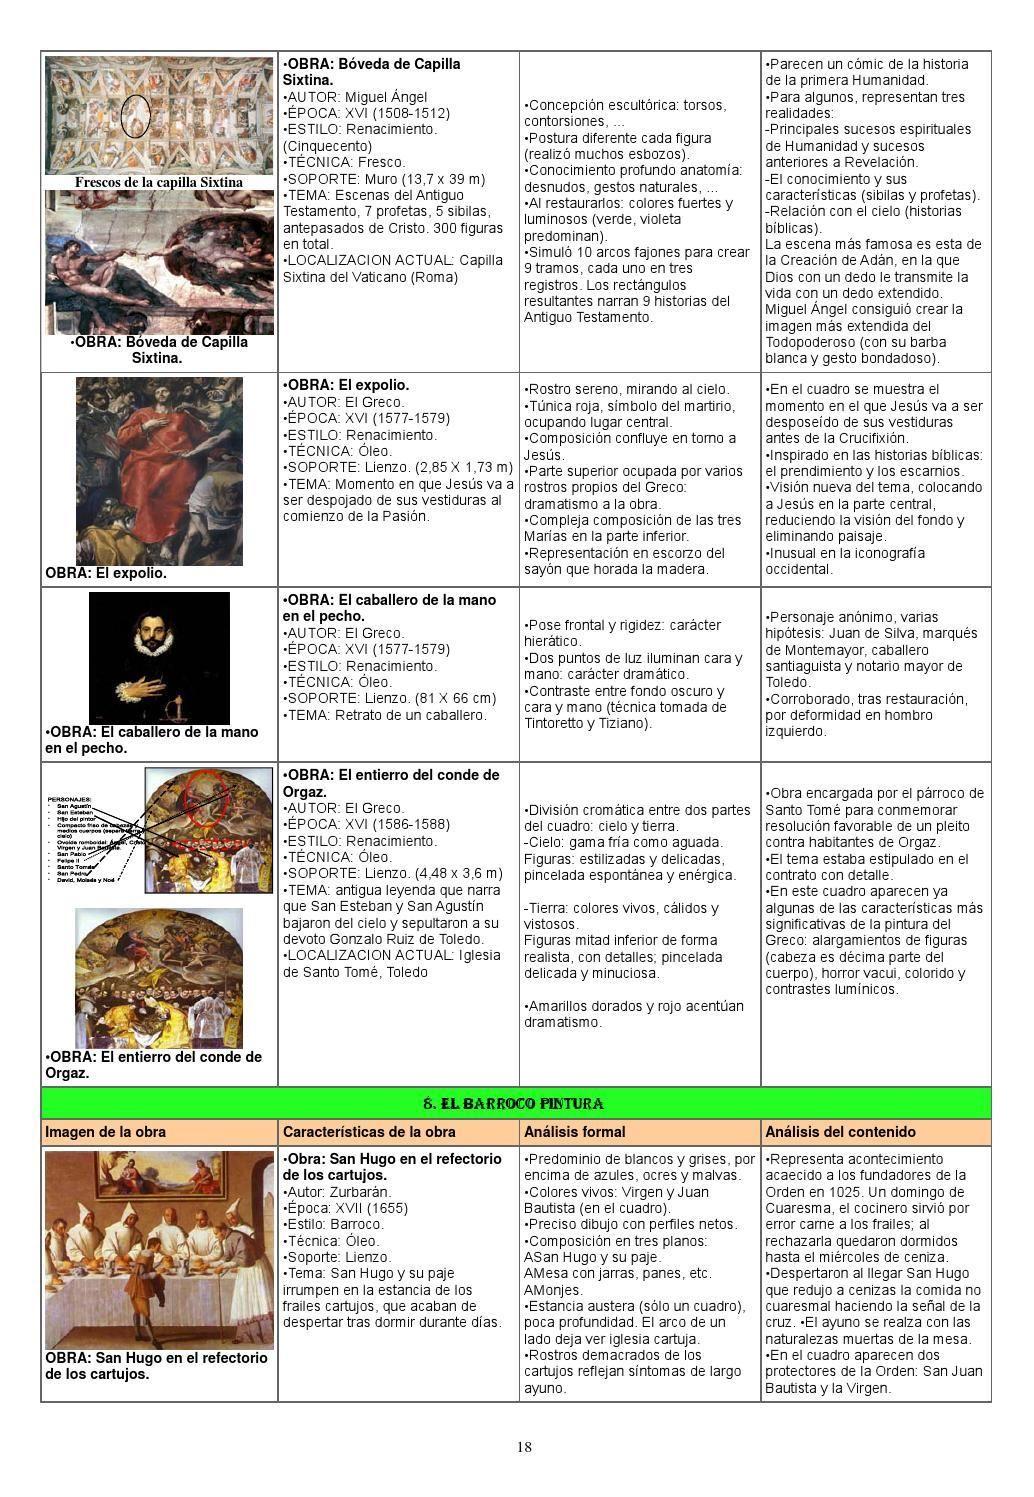 Resumen de historia del arte completo | Pinterest | Historia del ...